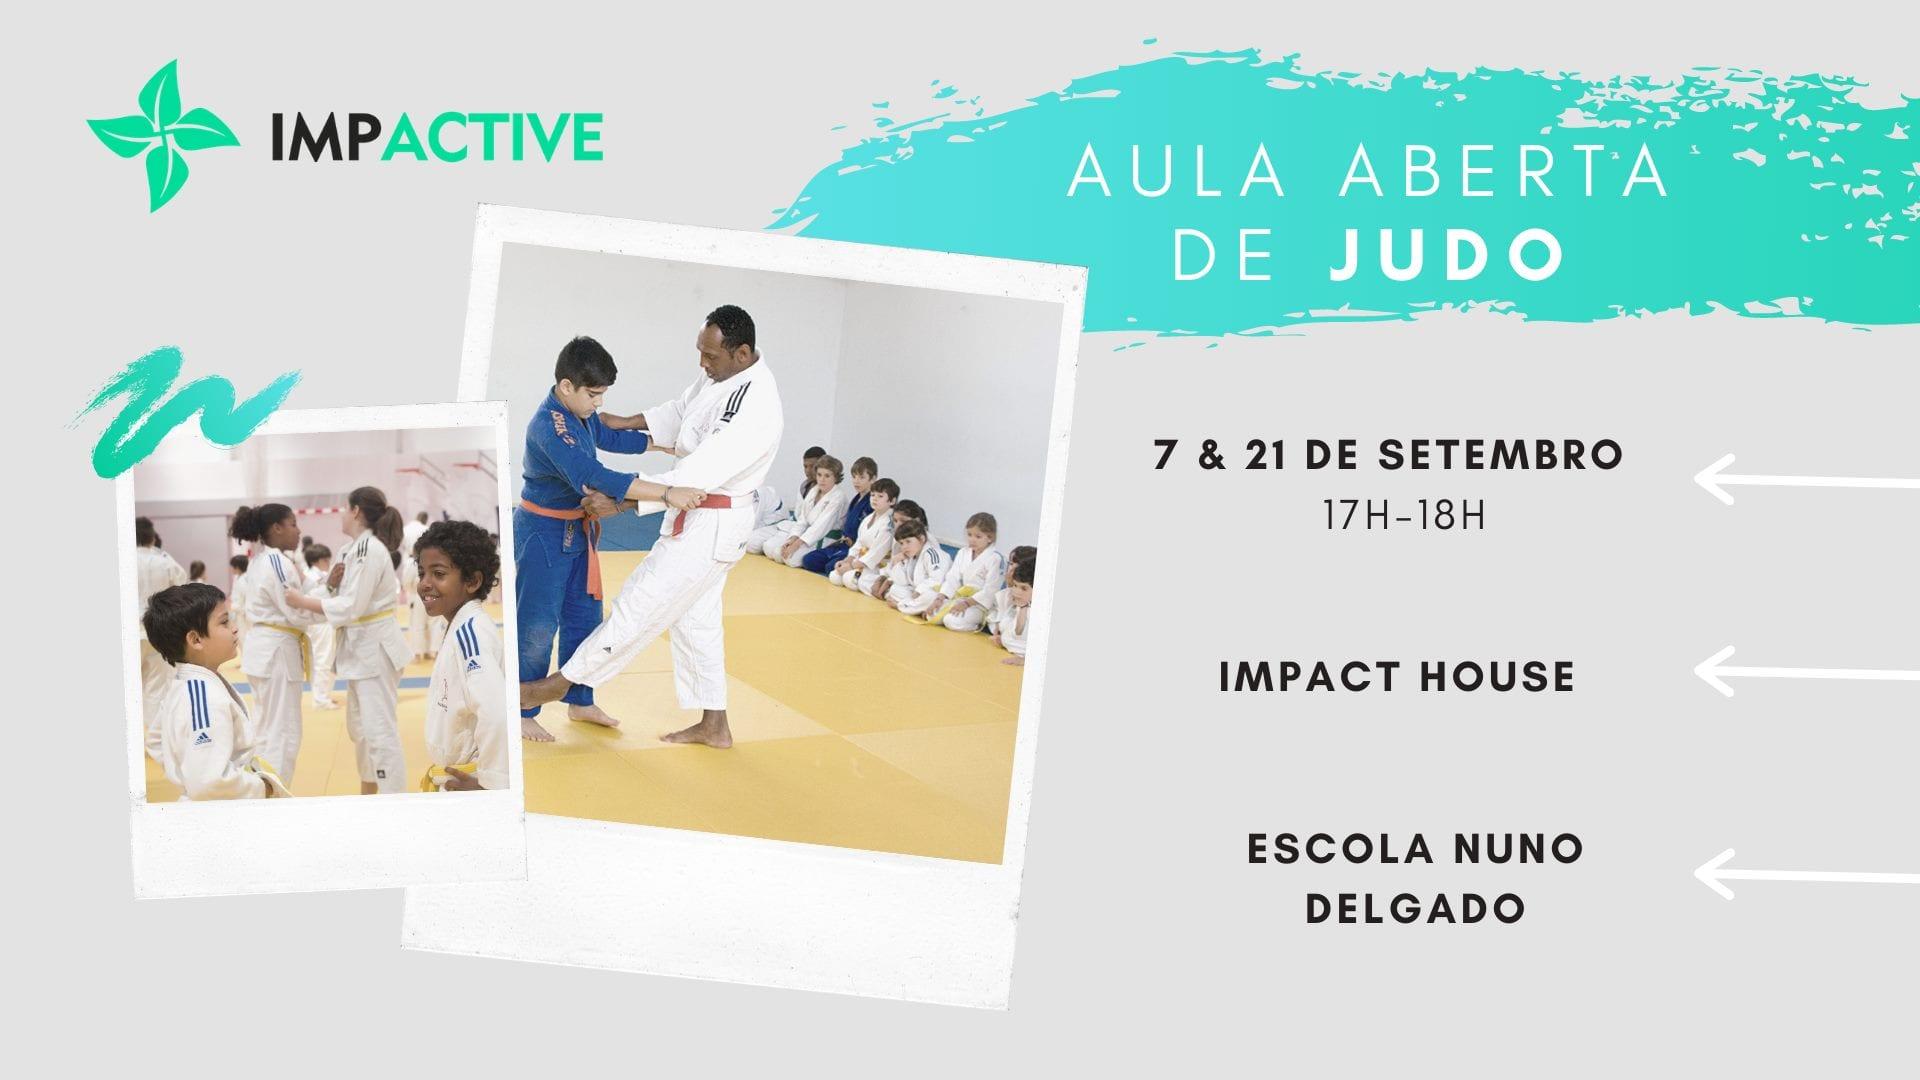 Impact House Judos